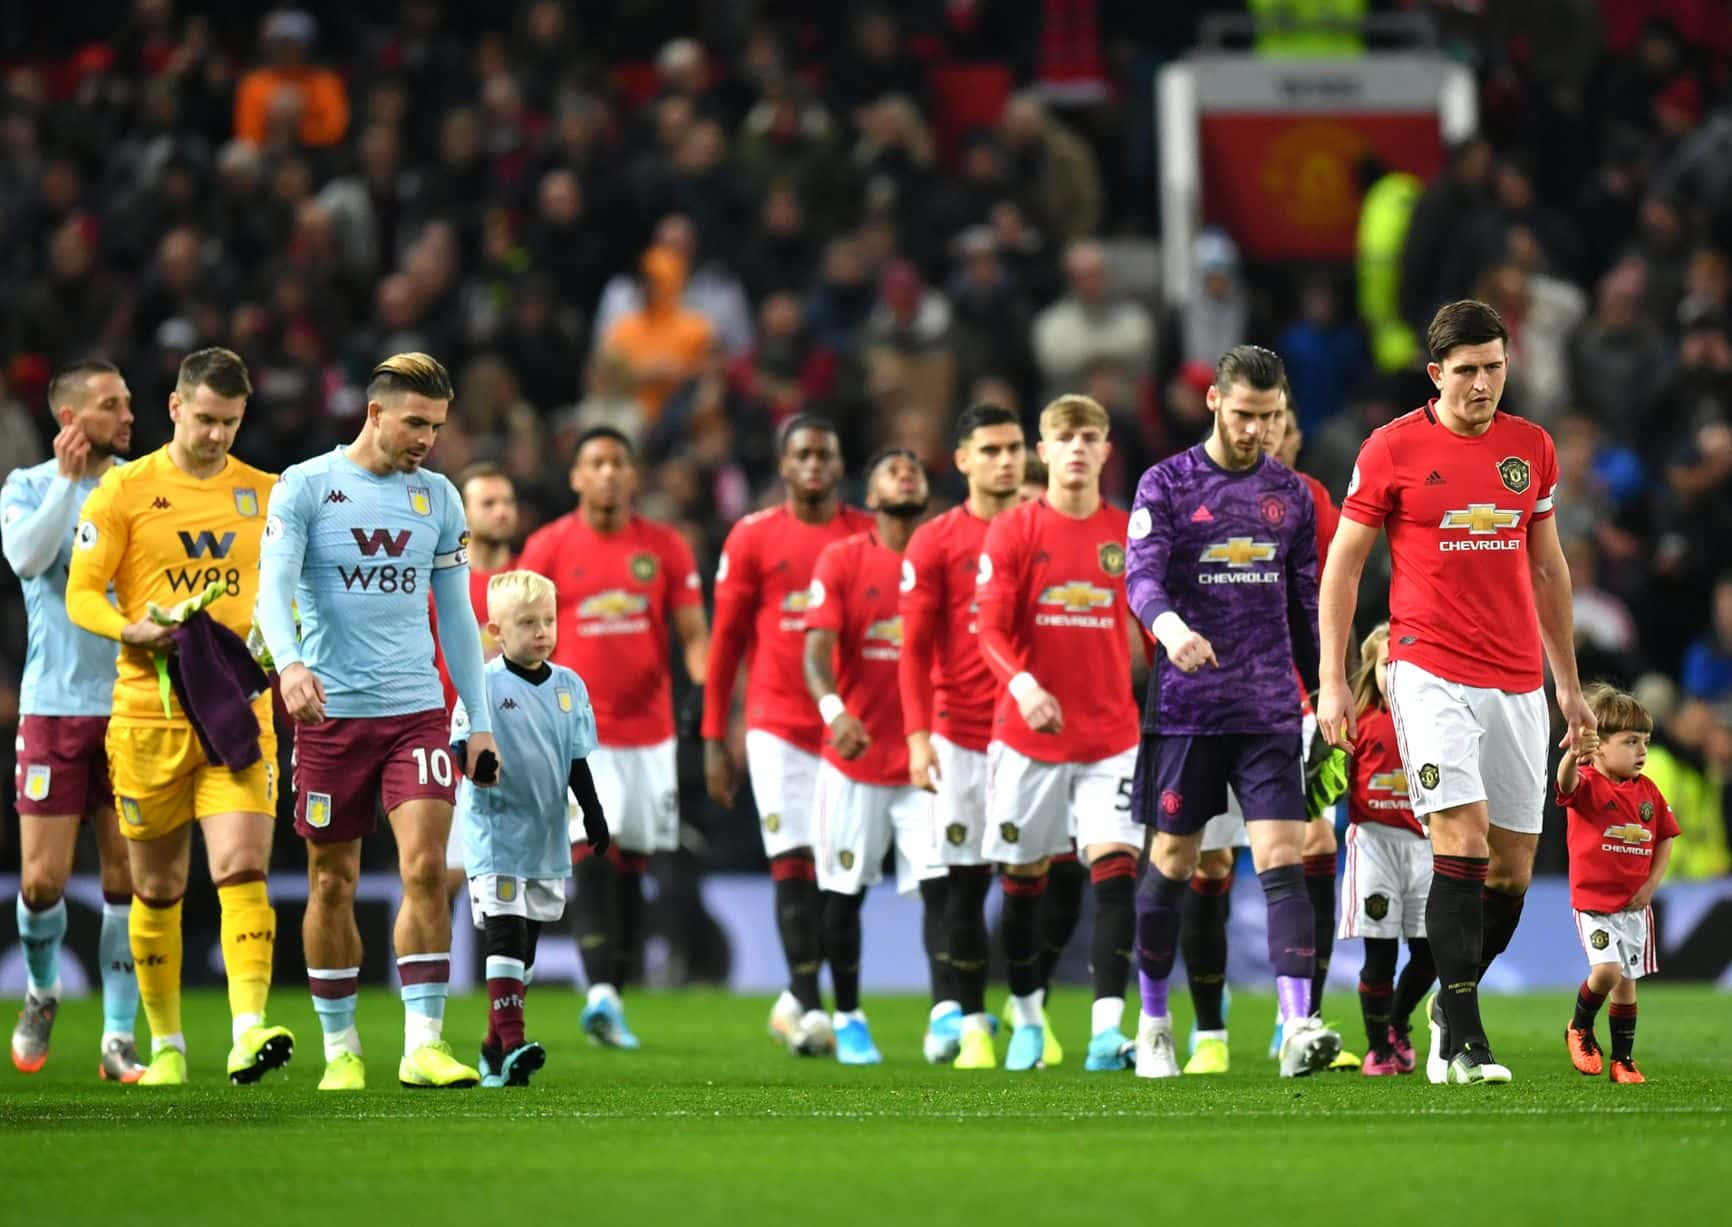 aston villa vs man united - photo #4